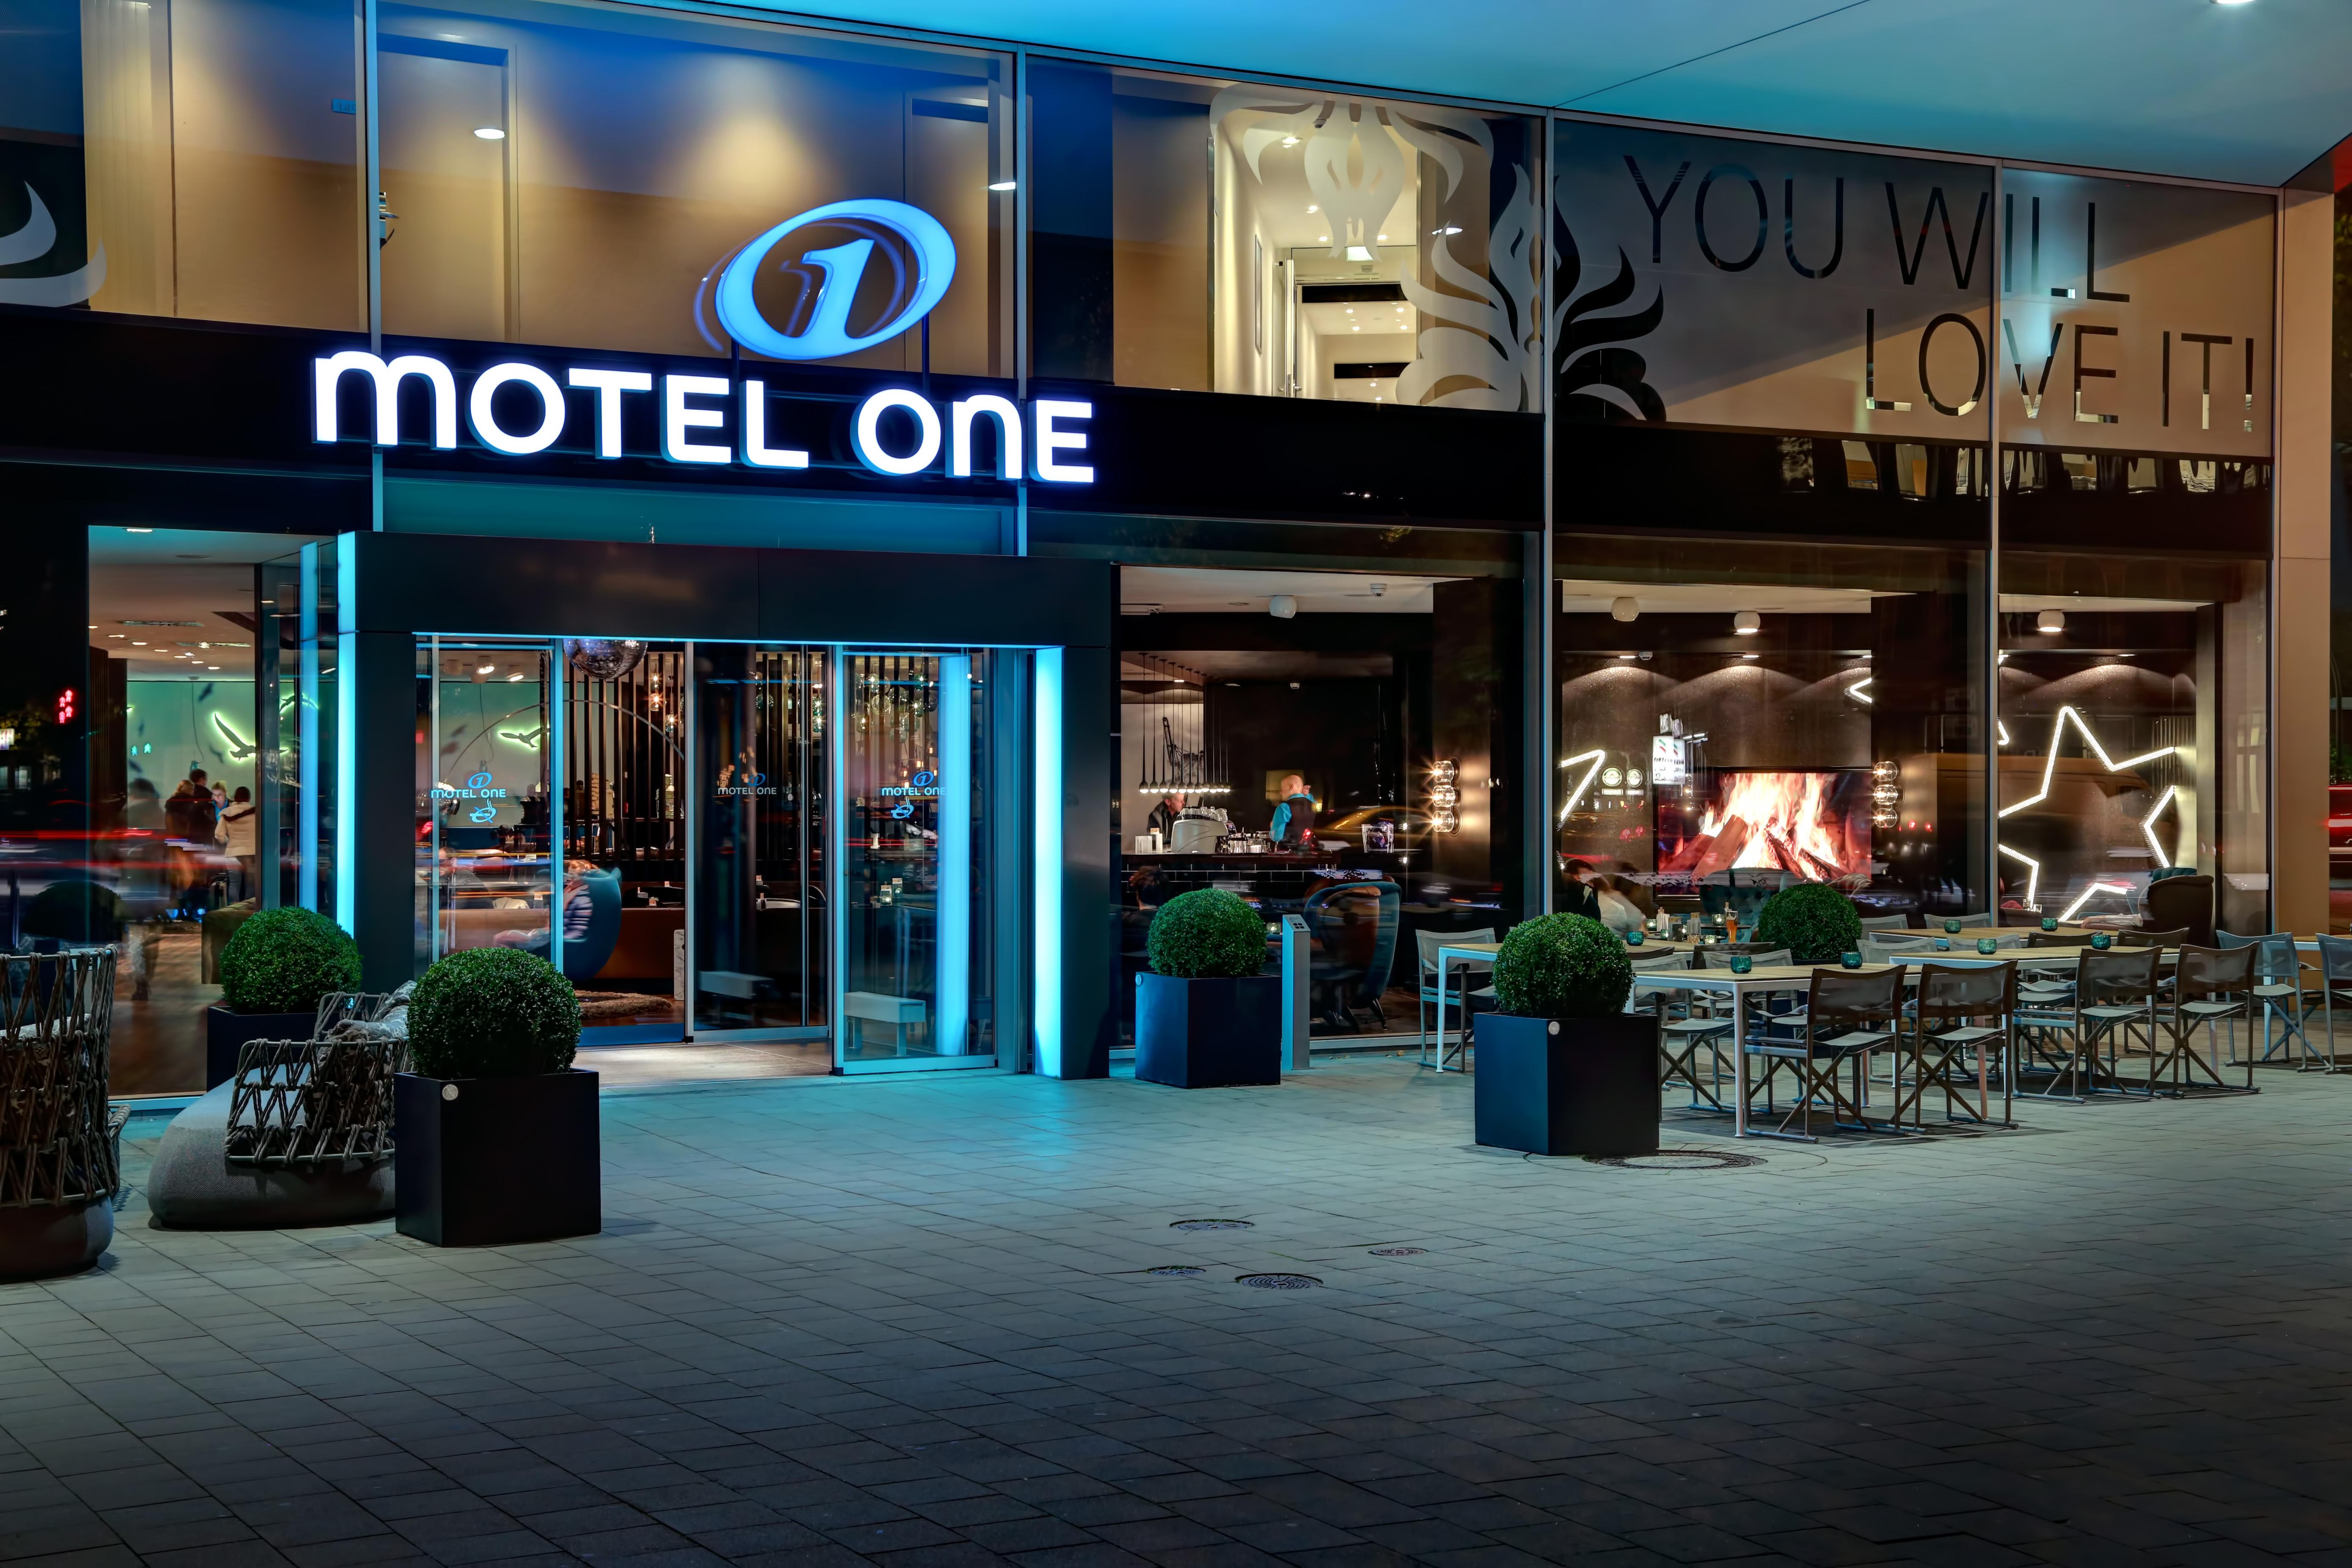 Hotel Hamburg am Michel Motel One | design hotels Hamburg am Michel